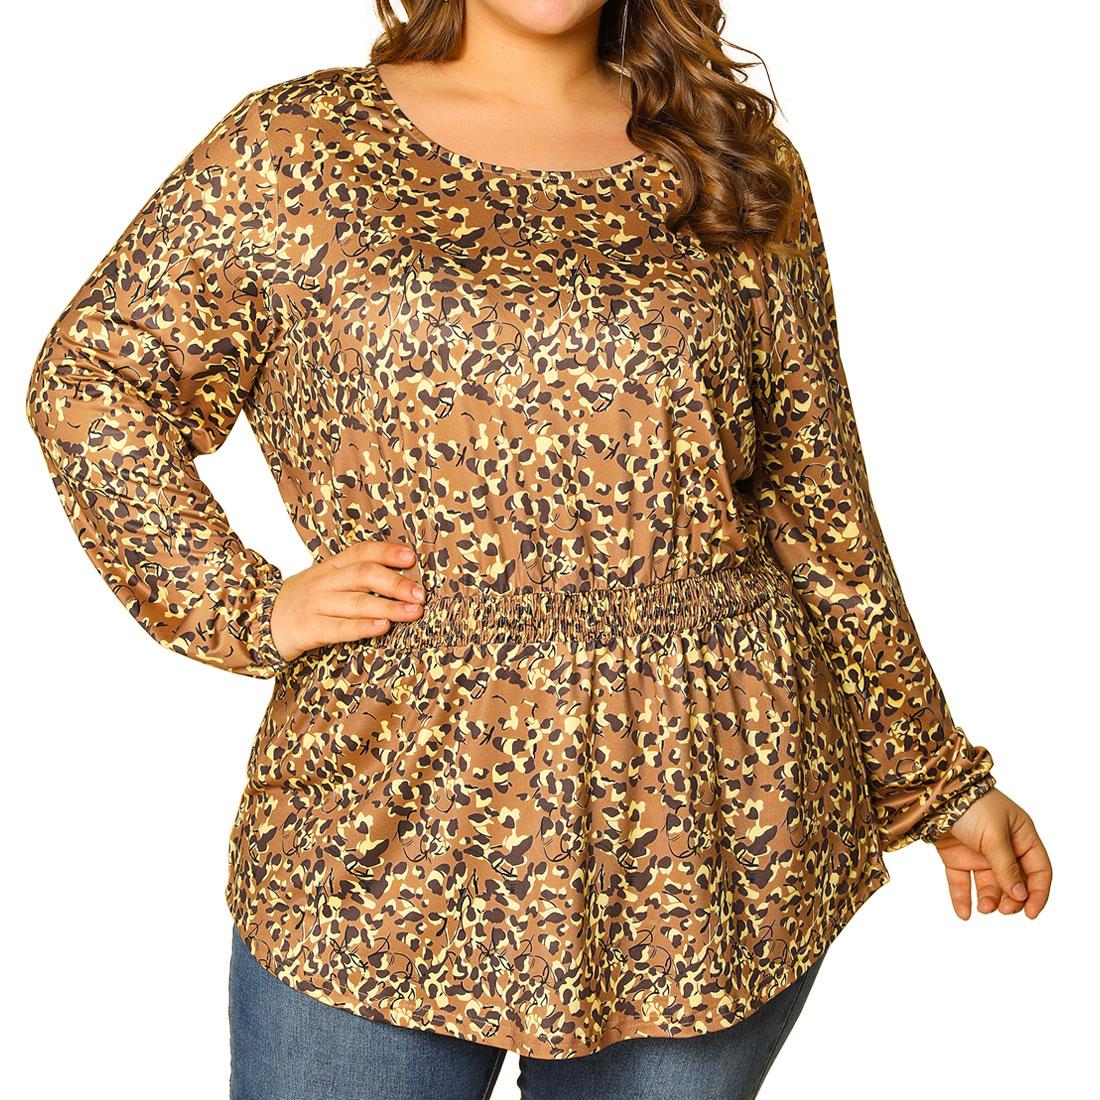 Women's Plus Size Blouse Floral Leopard Long Sleeve Tops Brown 1X